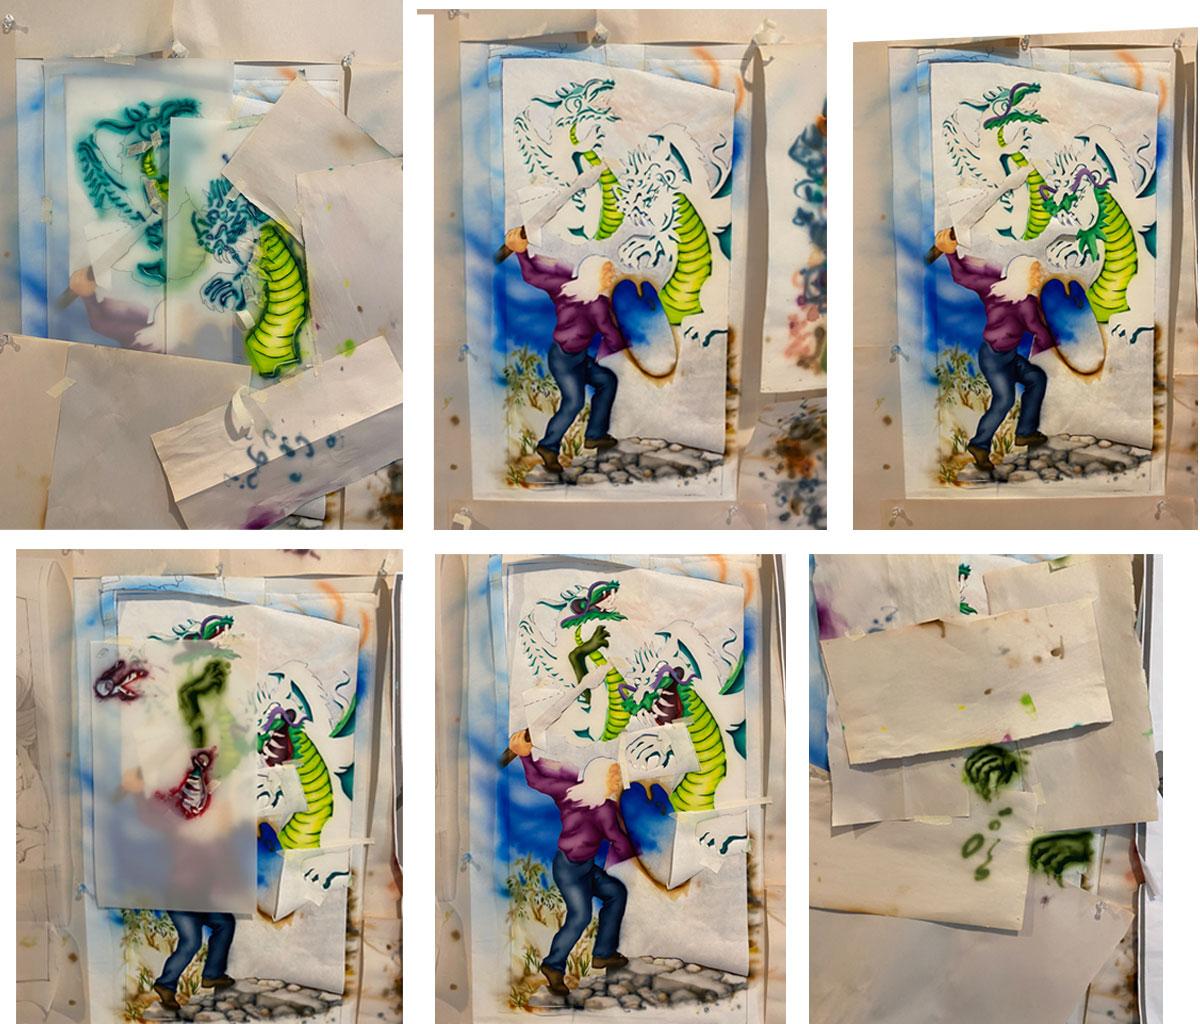 six views of air-brush work in progress